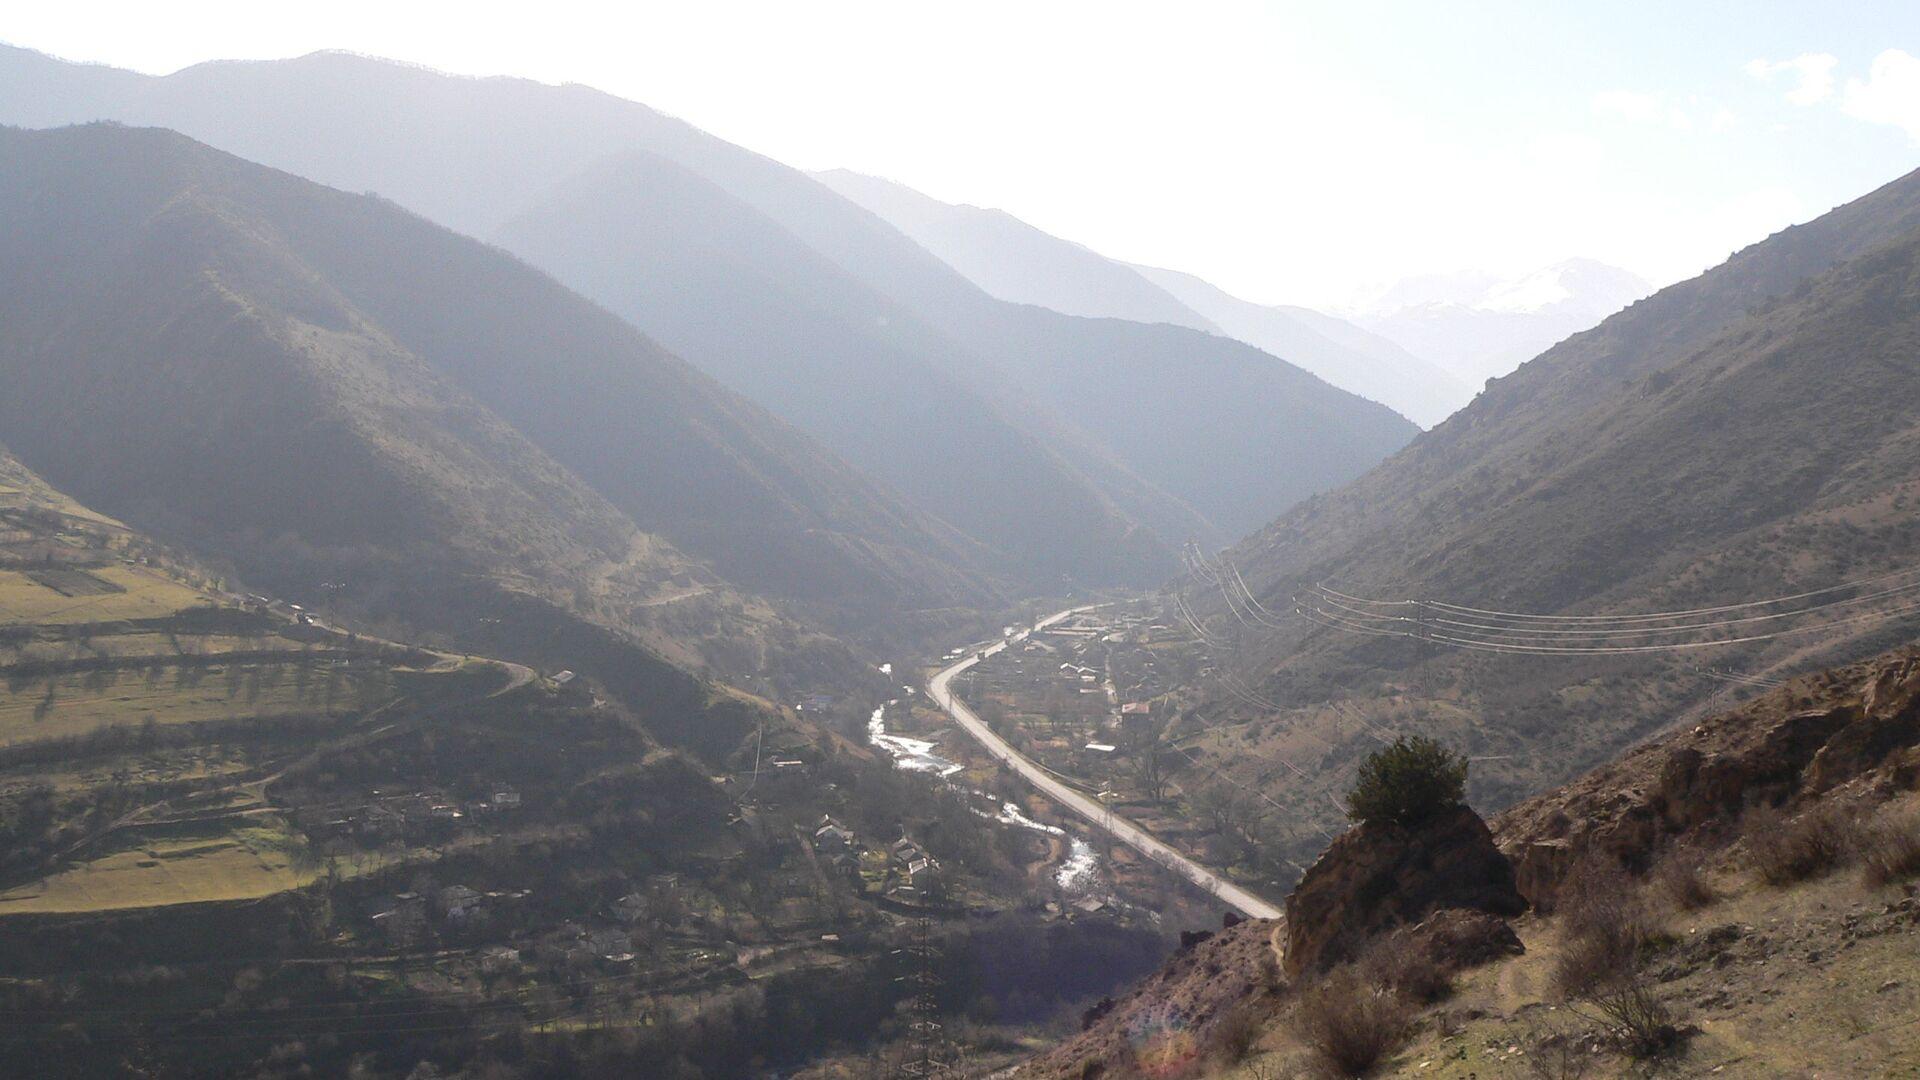 Widok regionu Road Syunik Azerbejdżan Armenia - Sputnik Polska, 1920, 29.07.2021